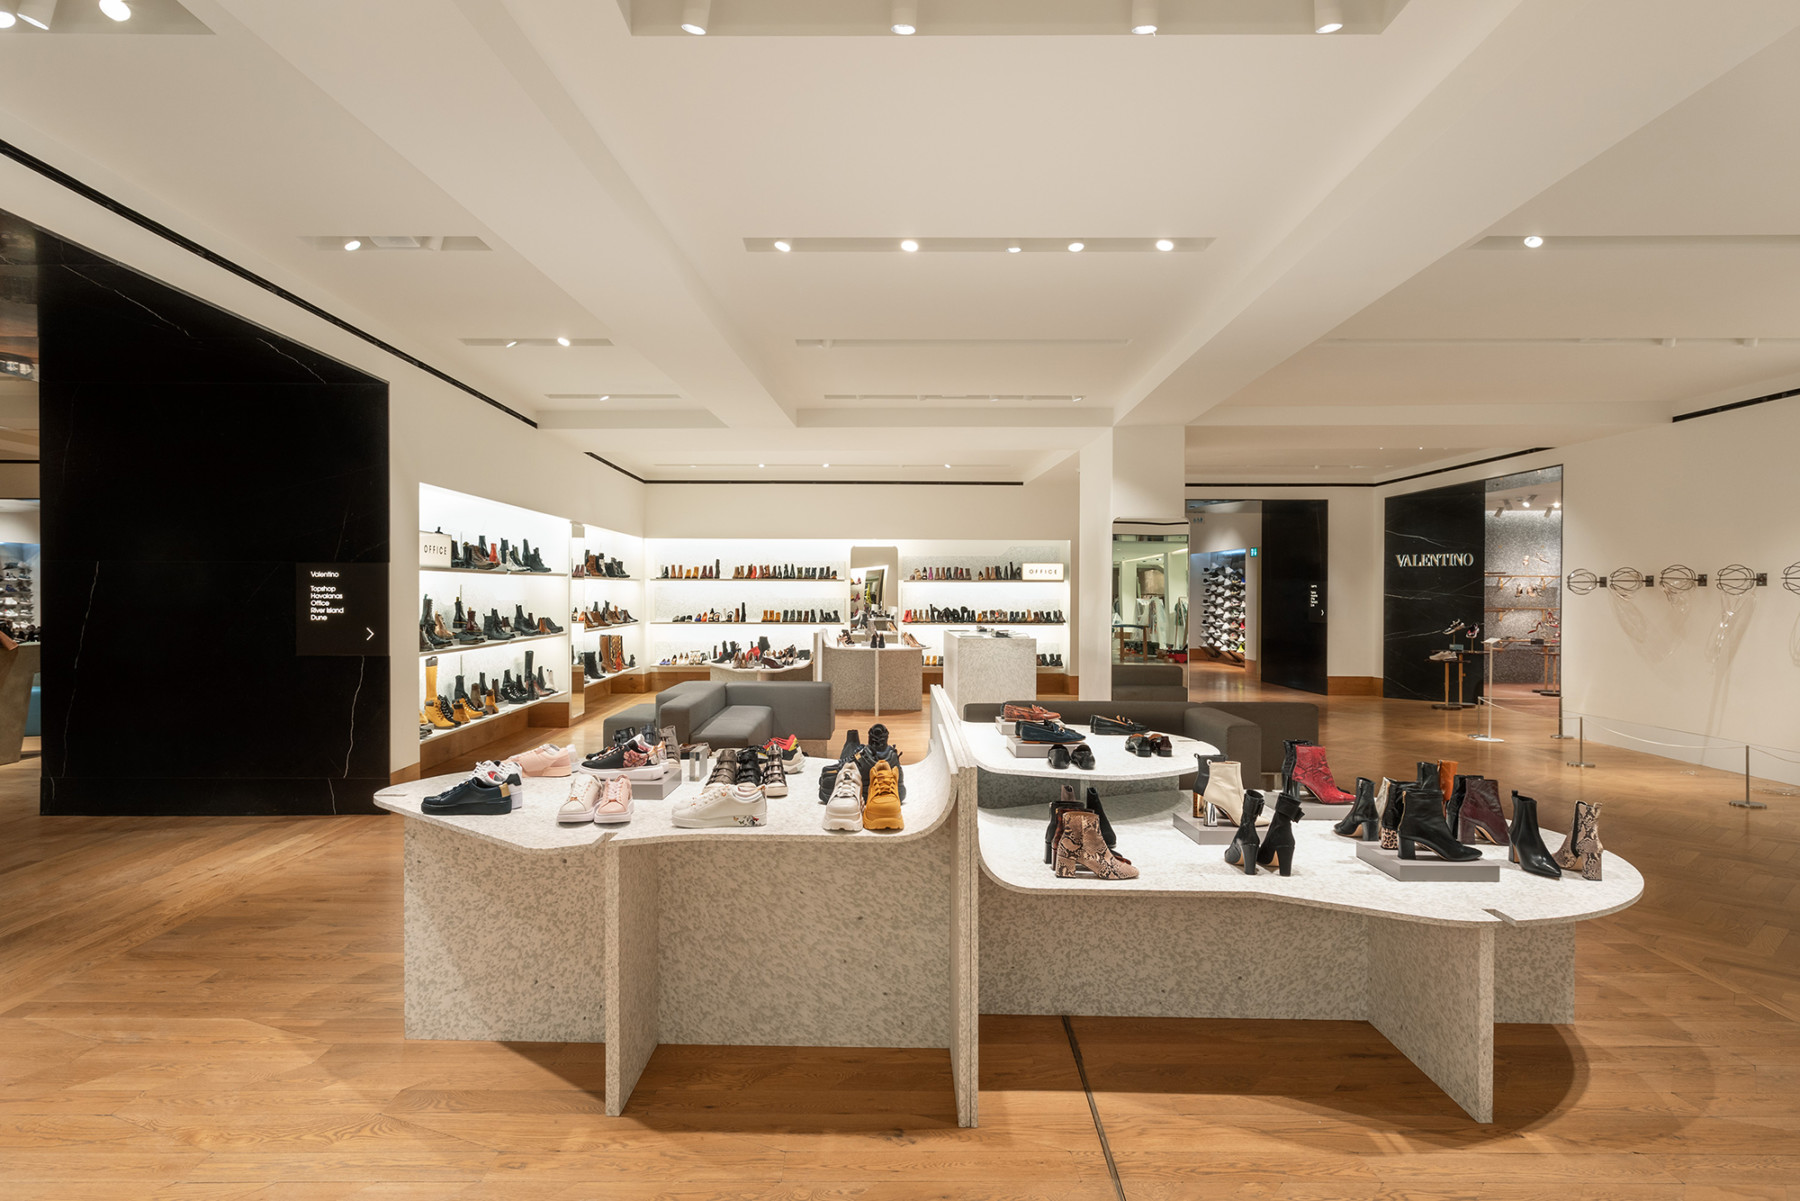 jamie-fobert-architects-selfridges-shoe-galleries-luxury-retail-concept-gallery-2-recycled-plastic